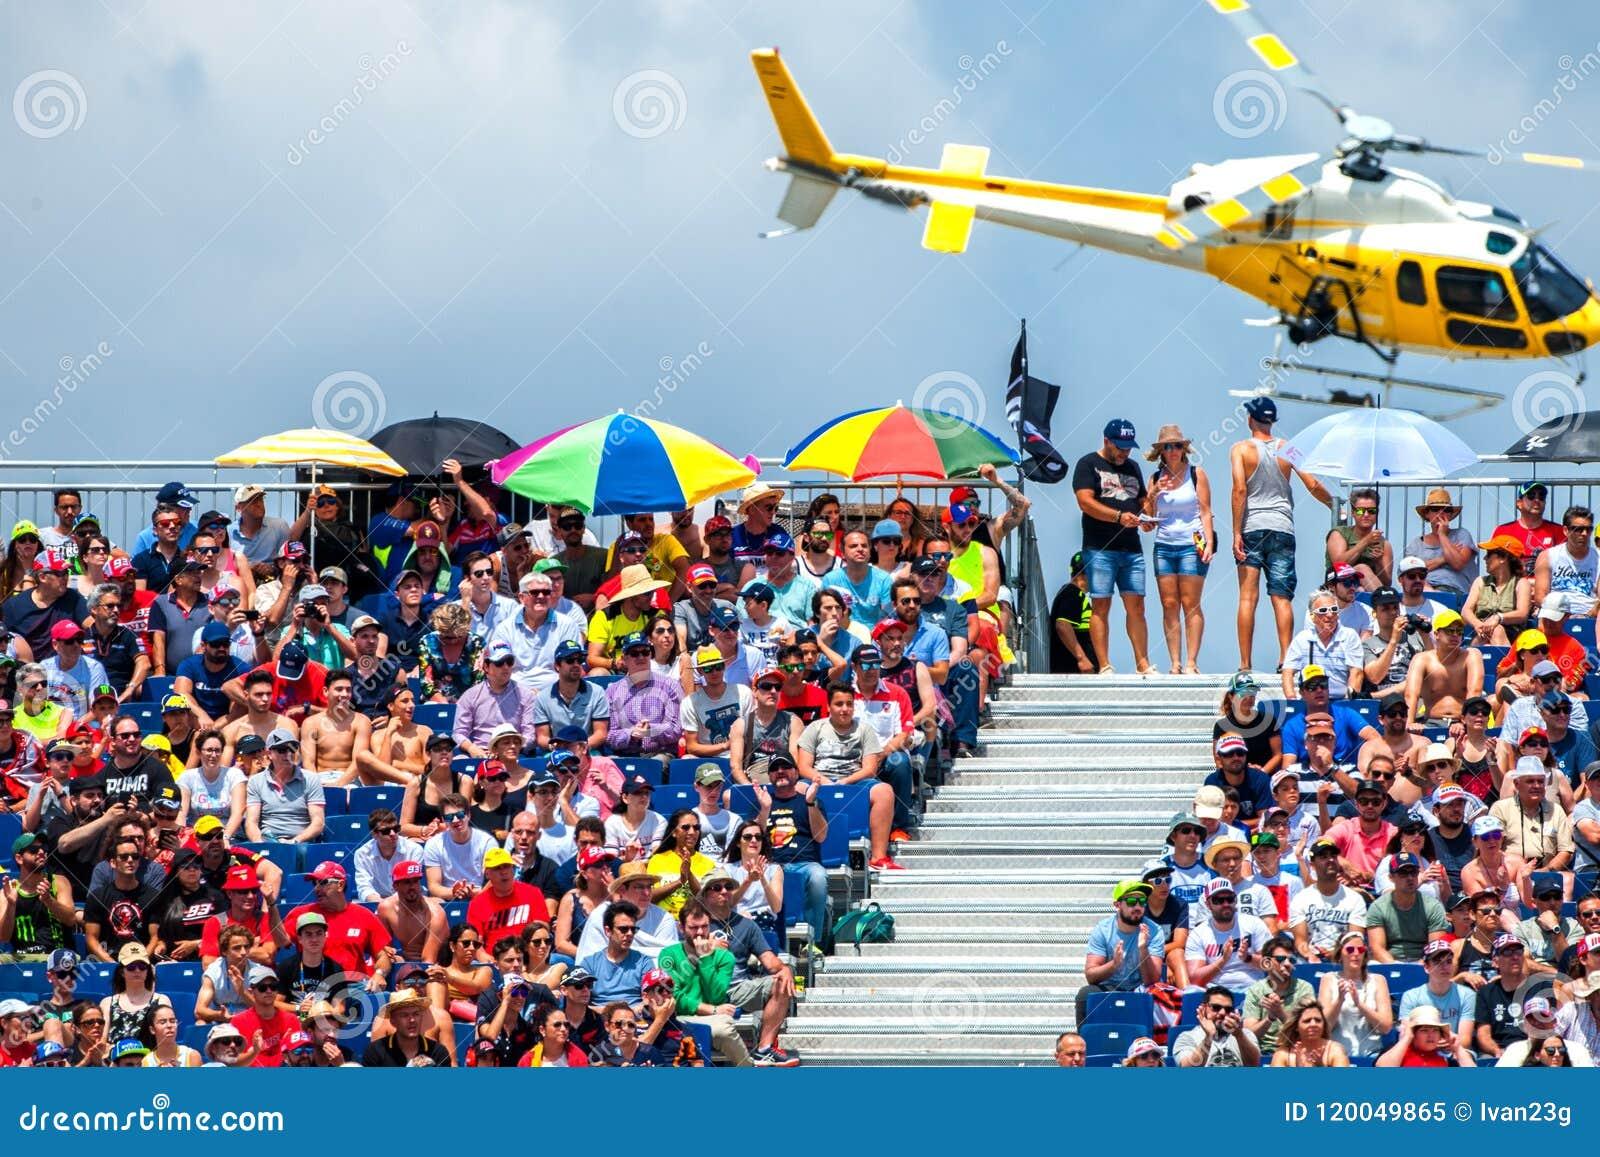 Gp Catalunya Motogp 2018 Editorial Image Image Of Event 120049865